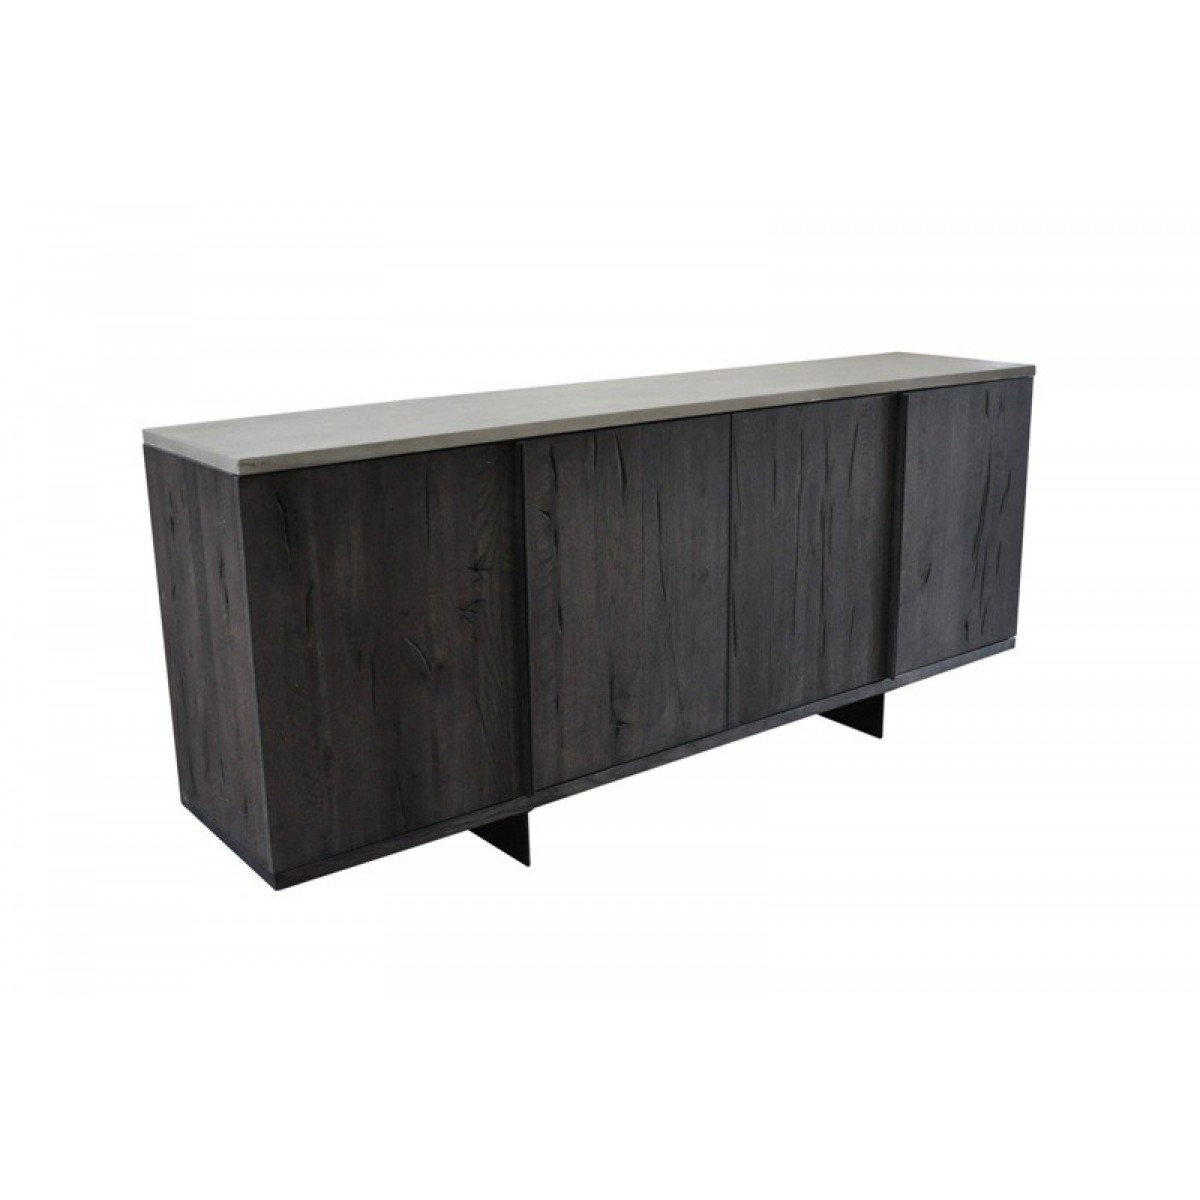 BM0143-dressoir-samos-4-deurs-eiken-betonlook-blad